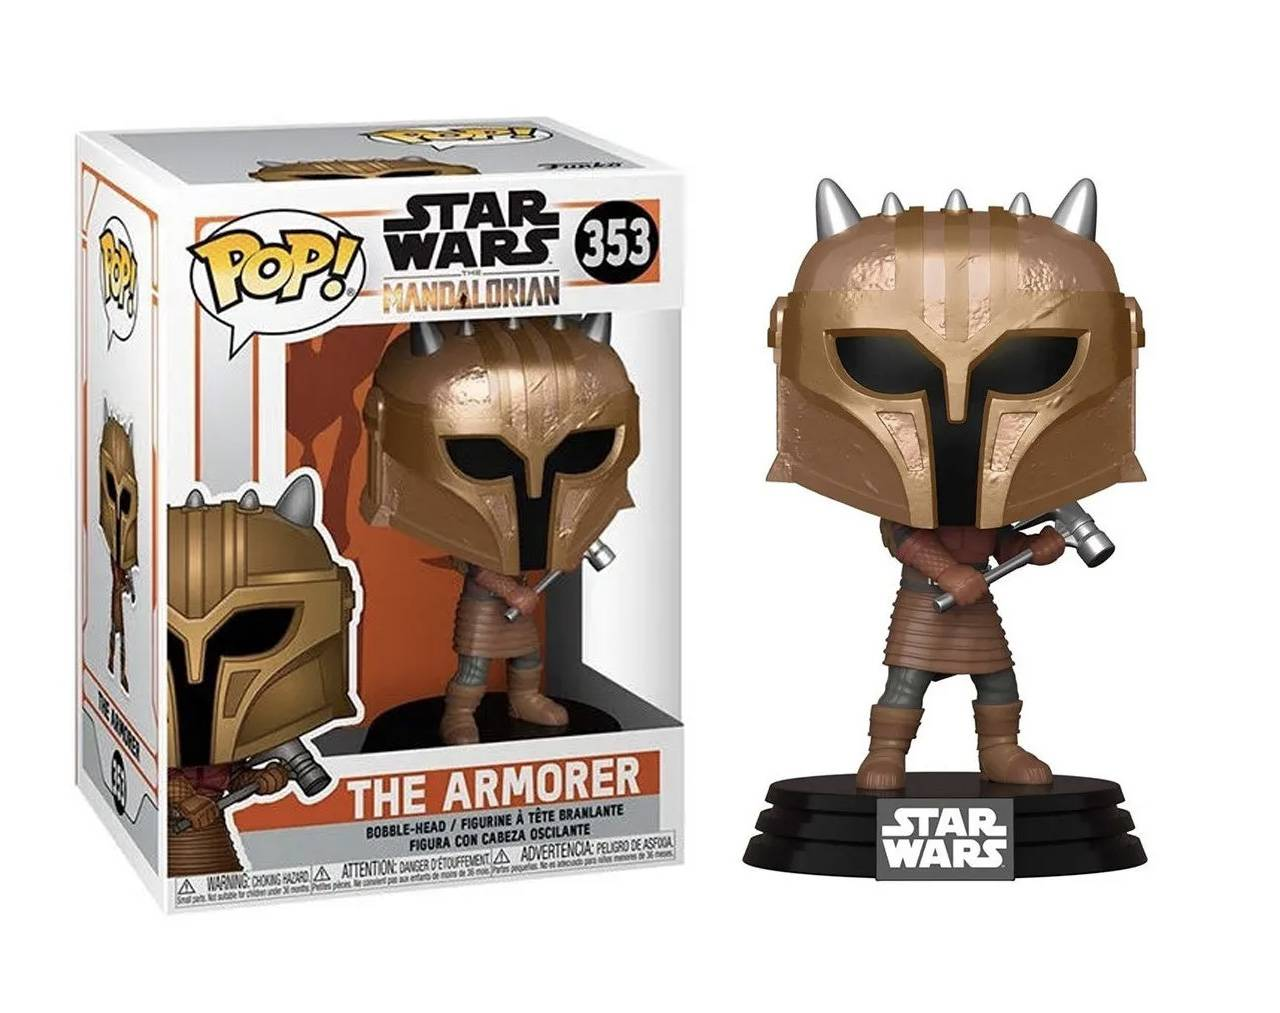 The Armorer Pop! Vinyl